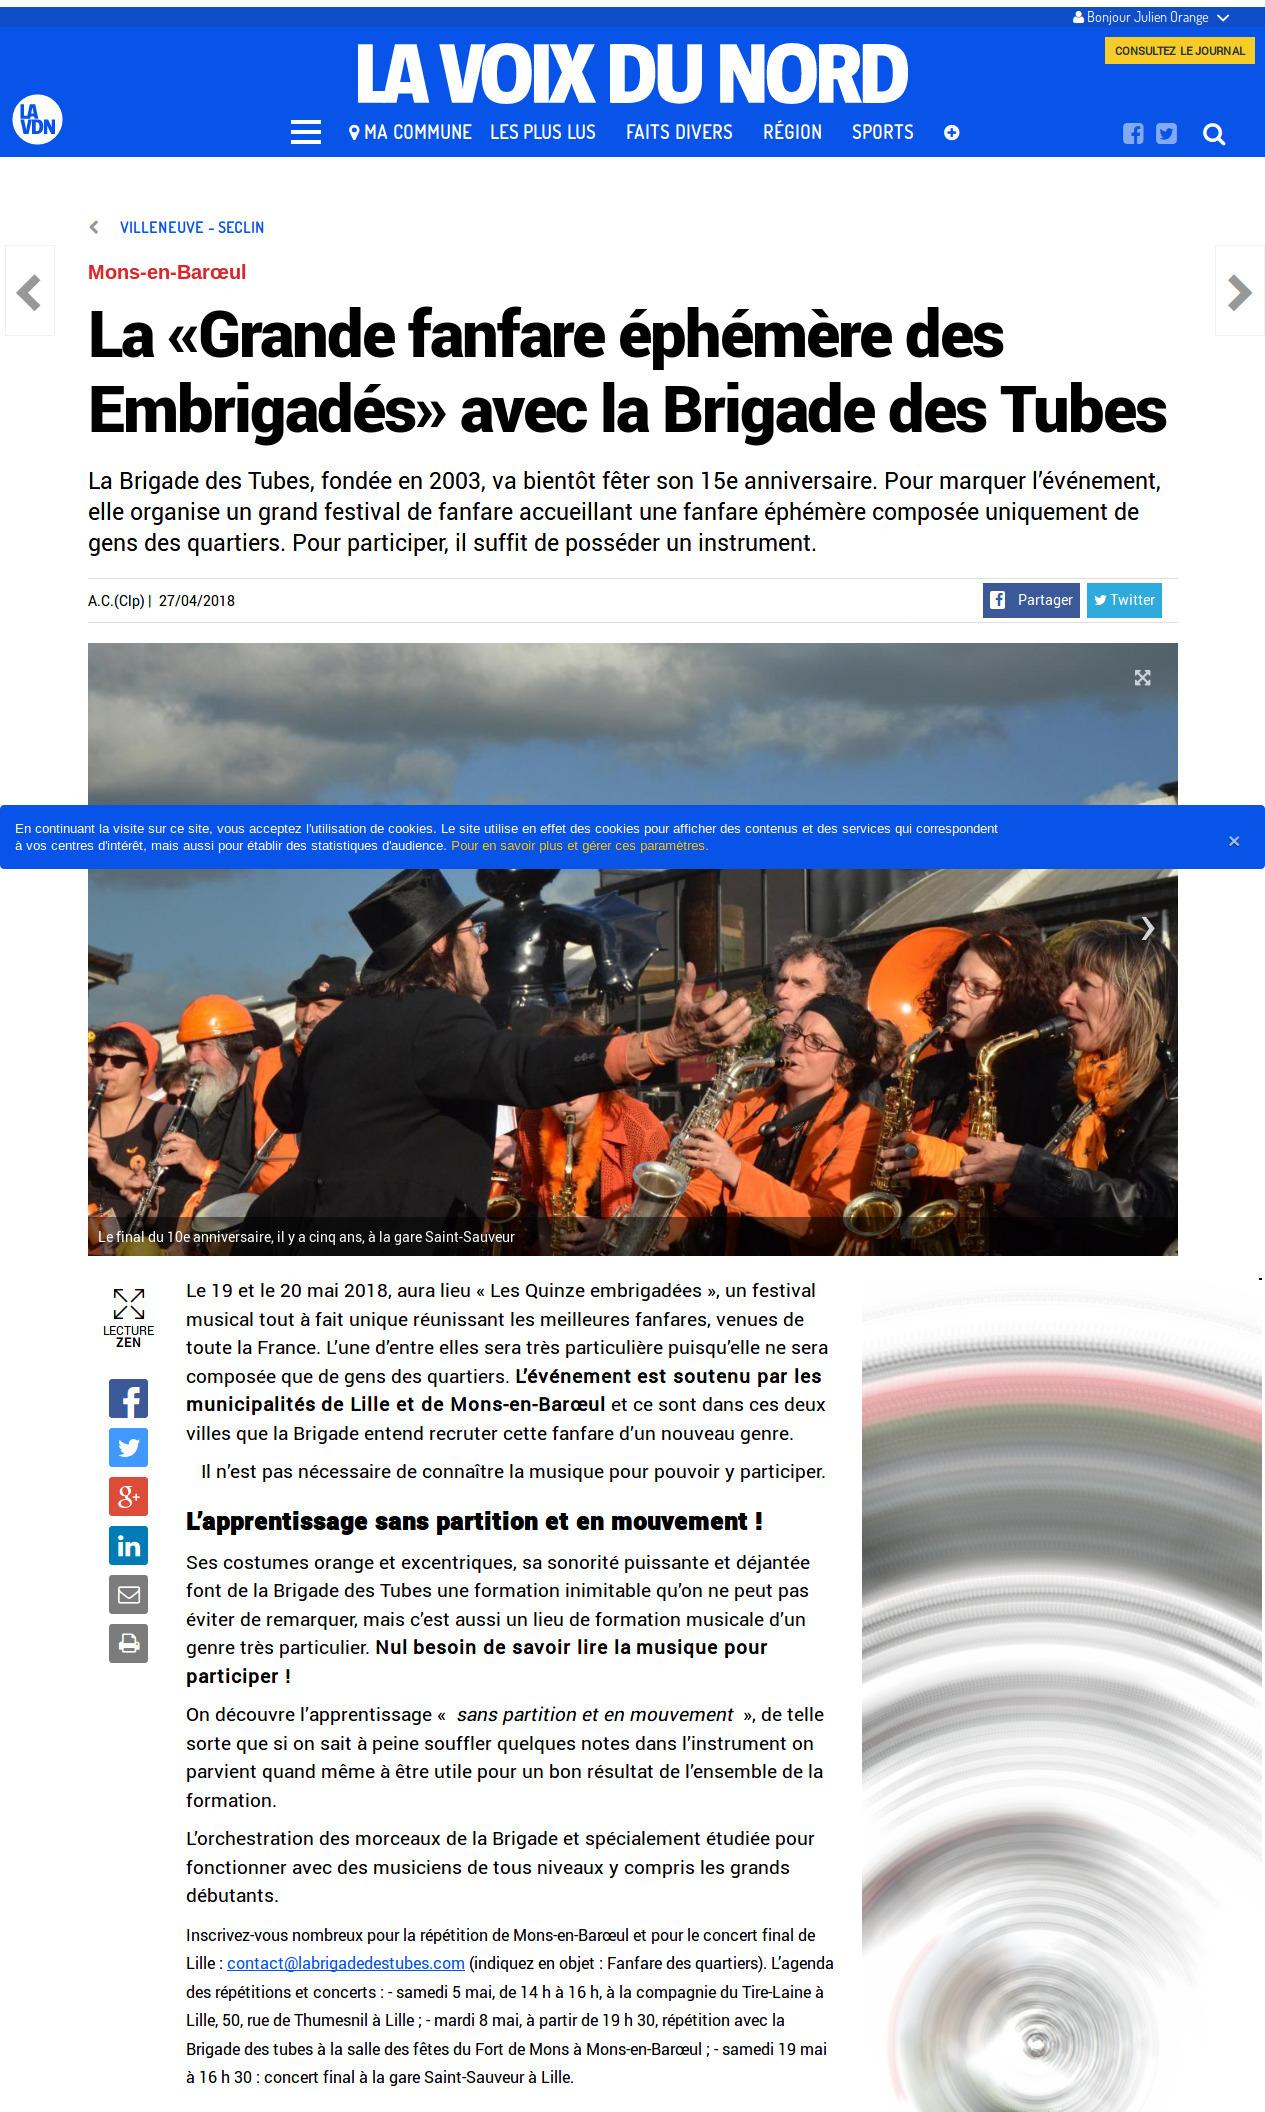 Screenshot-2018-5-28 Mons-en-Barœul - La «Grande fanfare éphémère des Embrigadés» avec la Brigade des Tubes